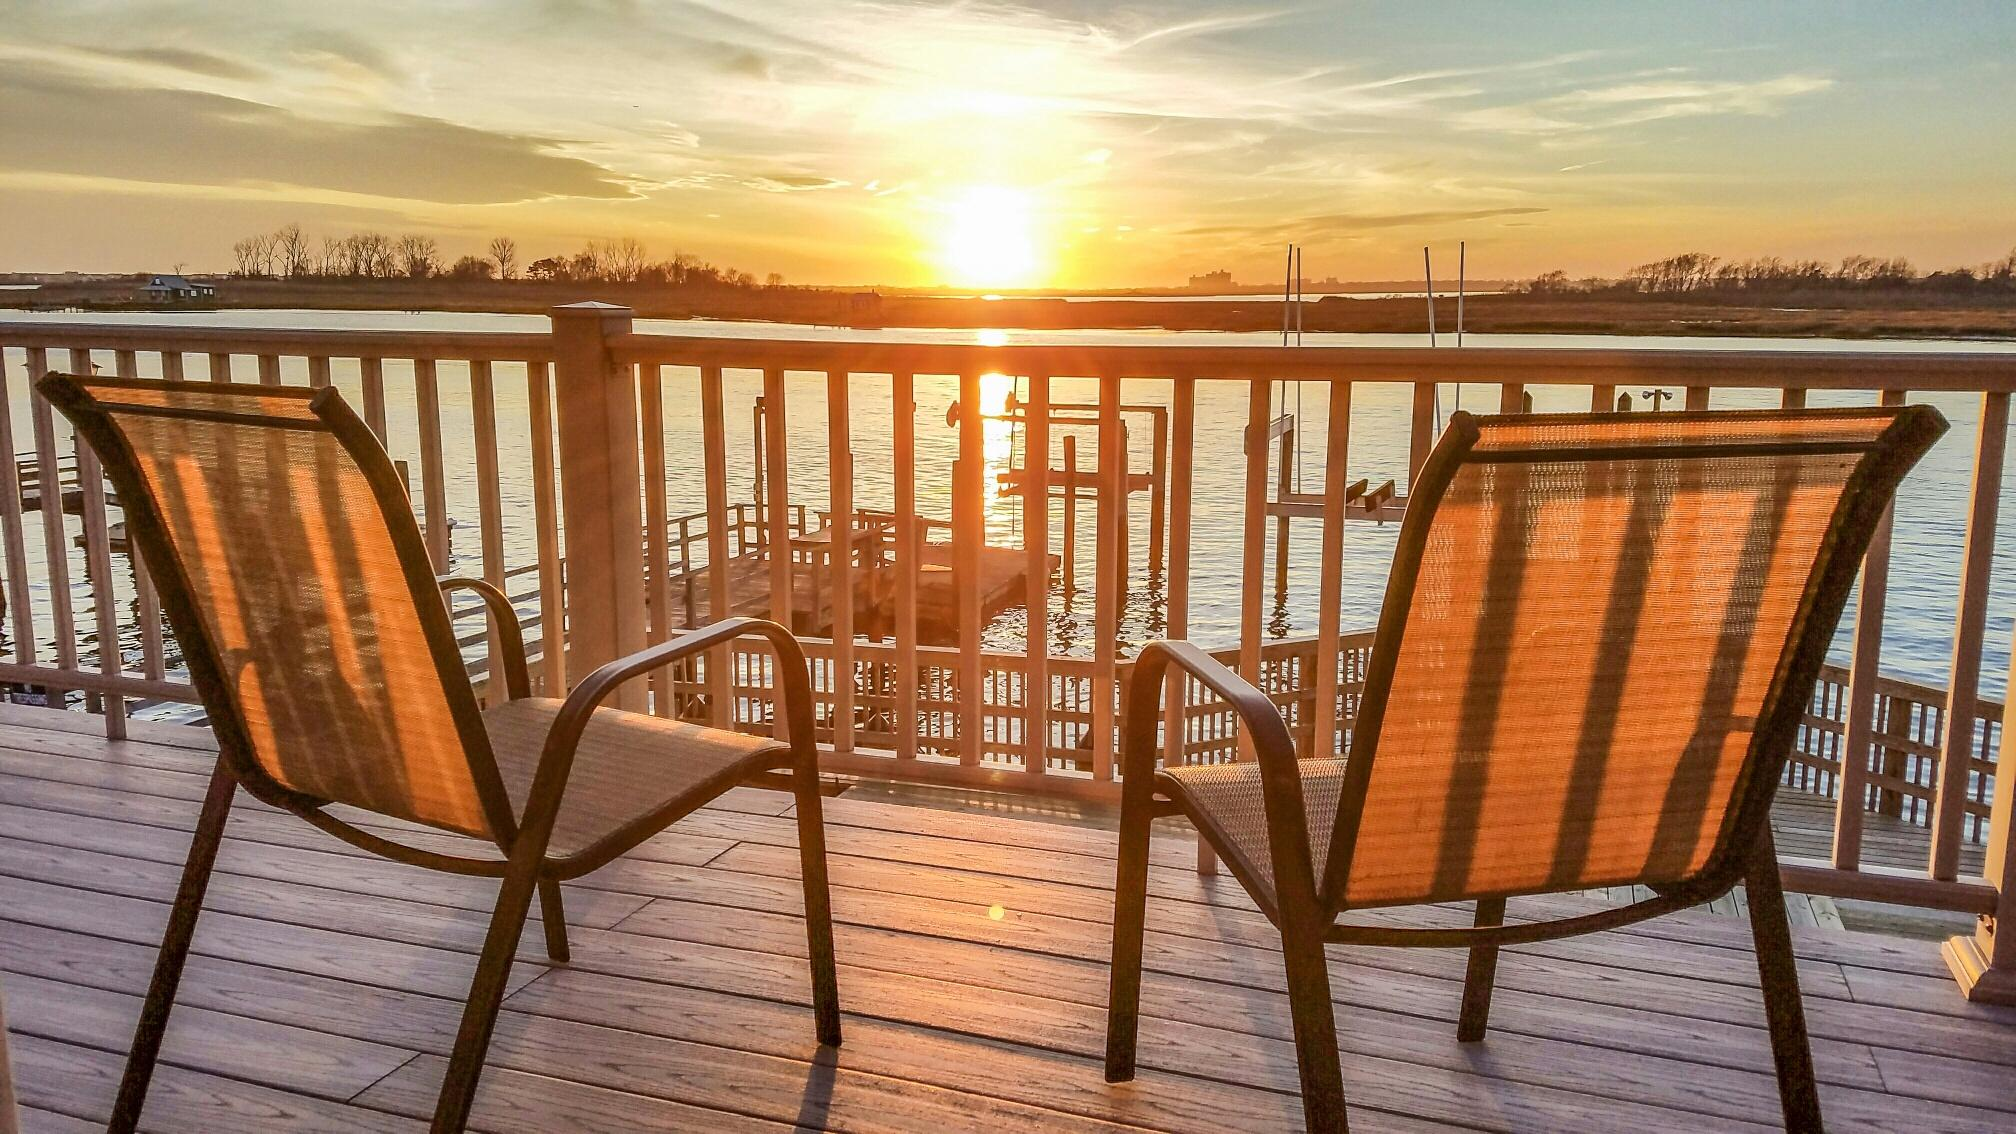 Hamilton Park Homes For Sale & Real Estate | Roslyn, Long Island NY MLS